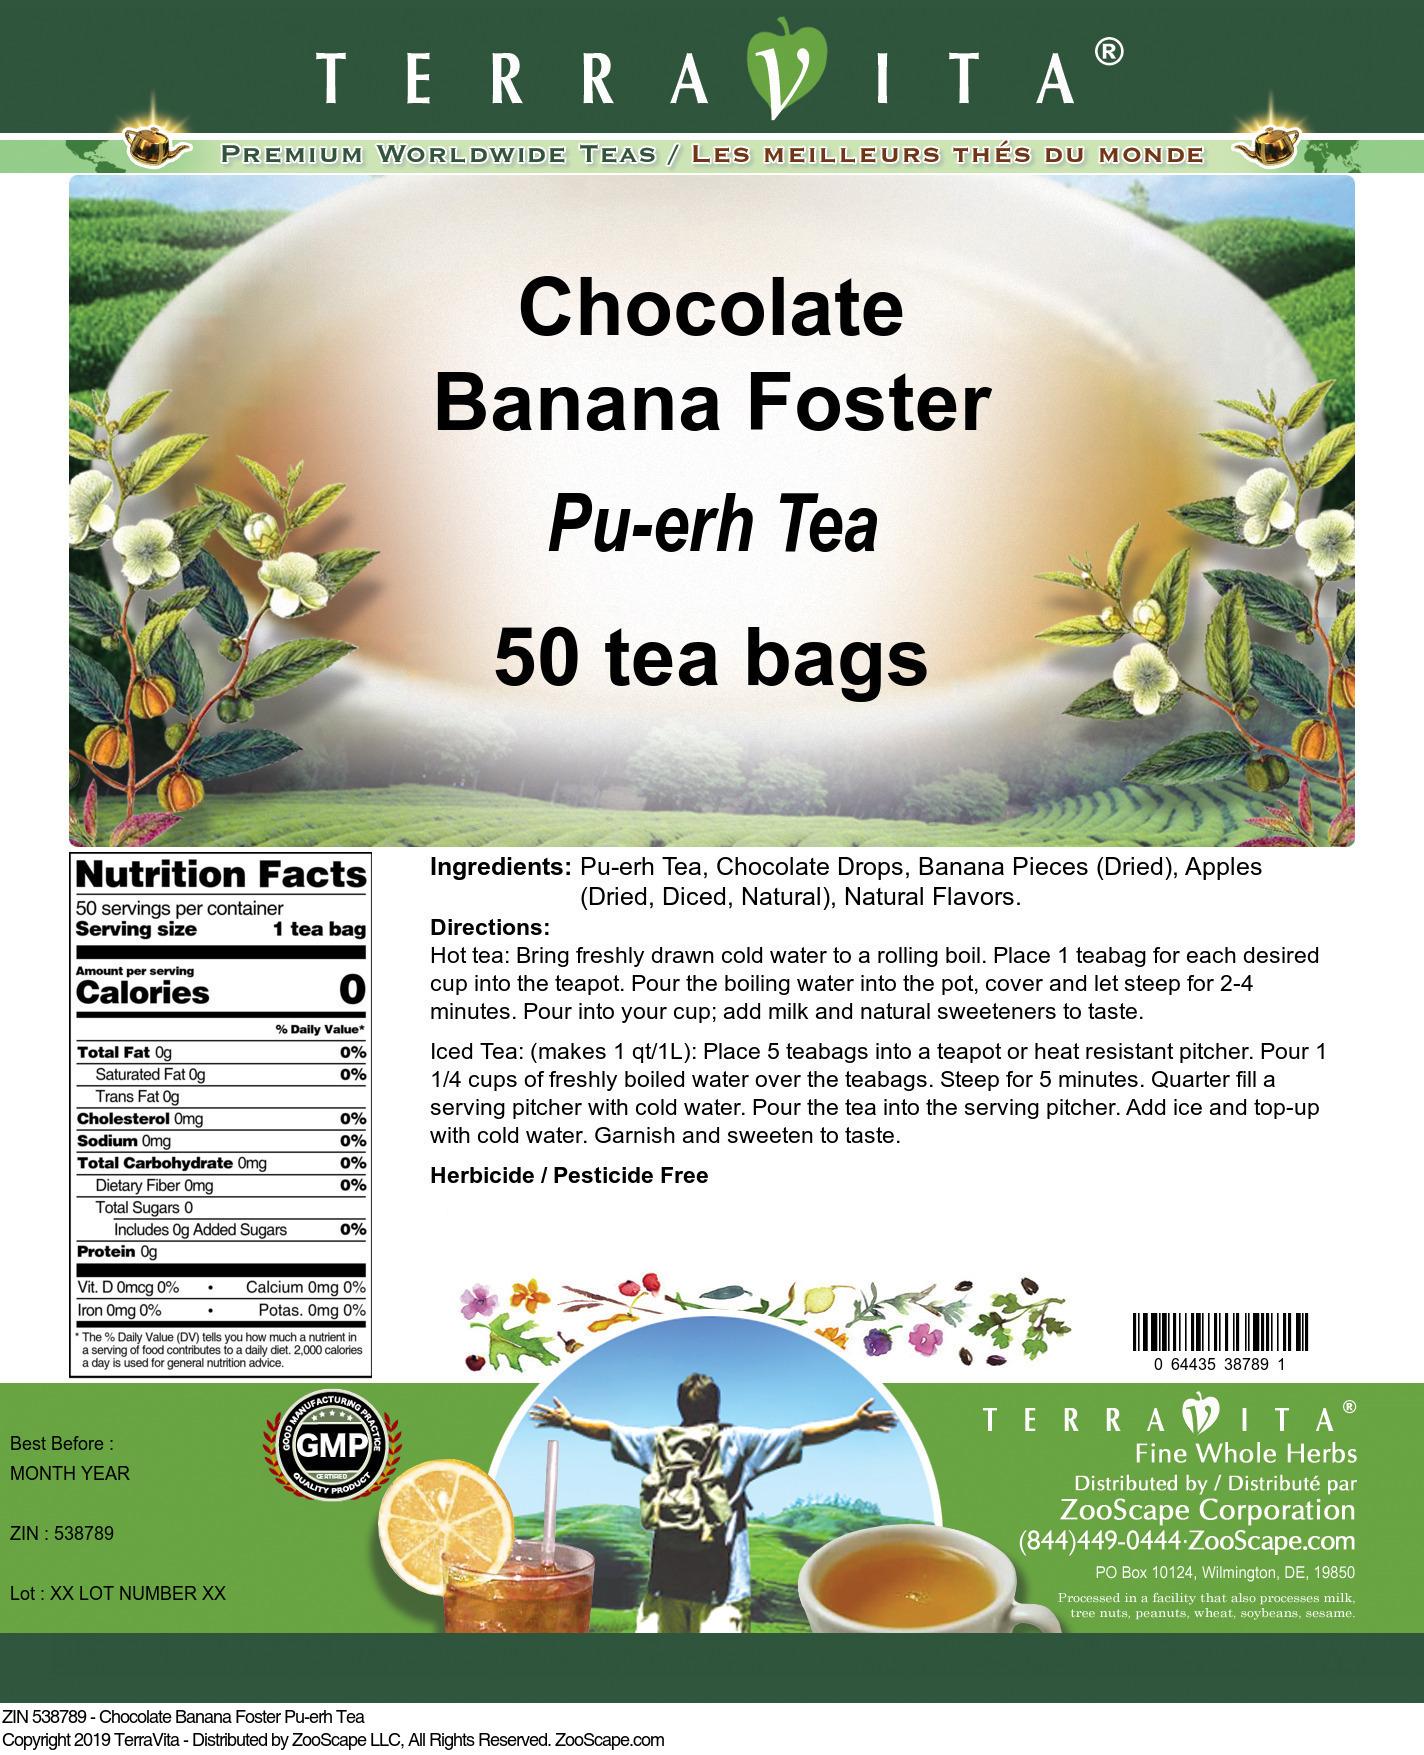 Chocolate Banana Foster Pu-erh Tea